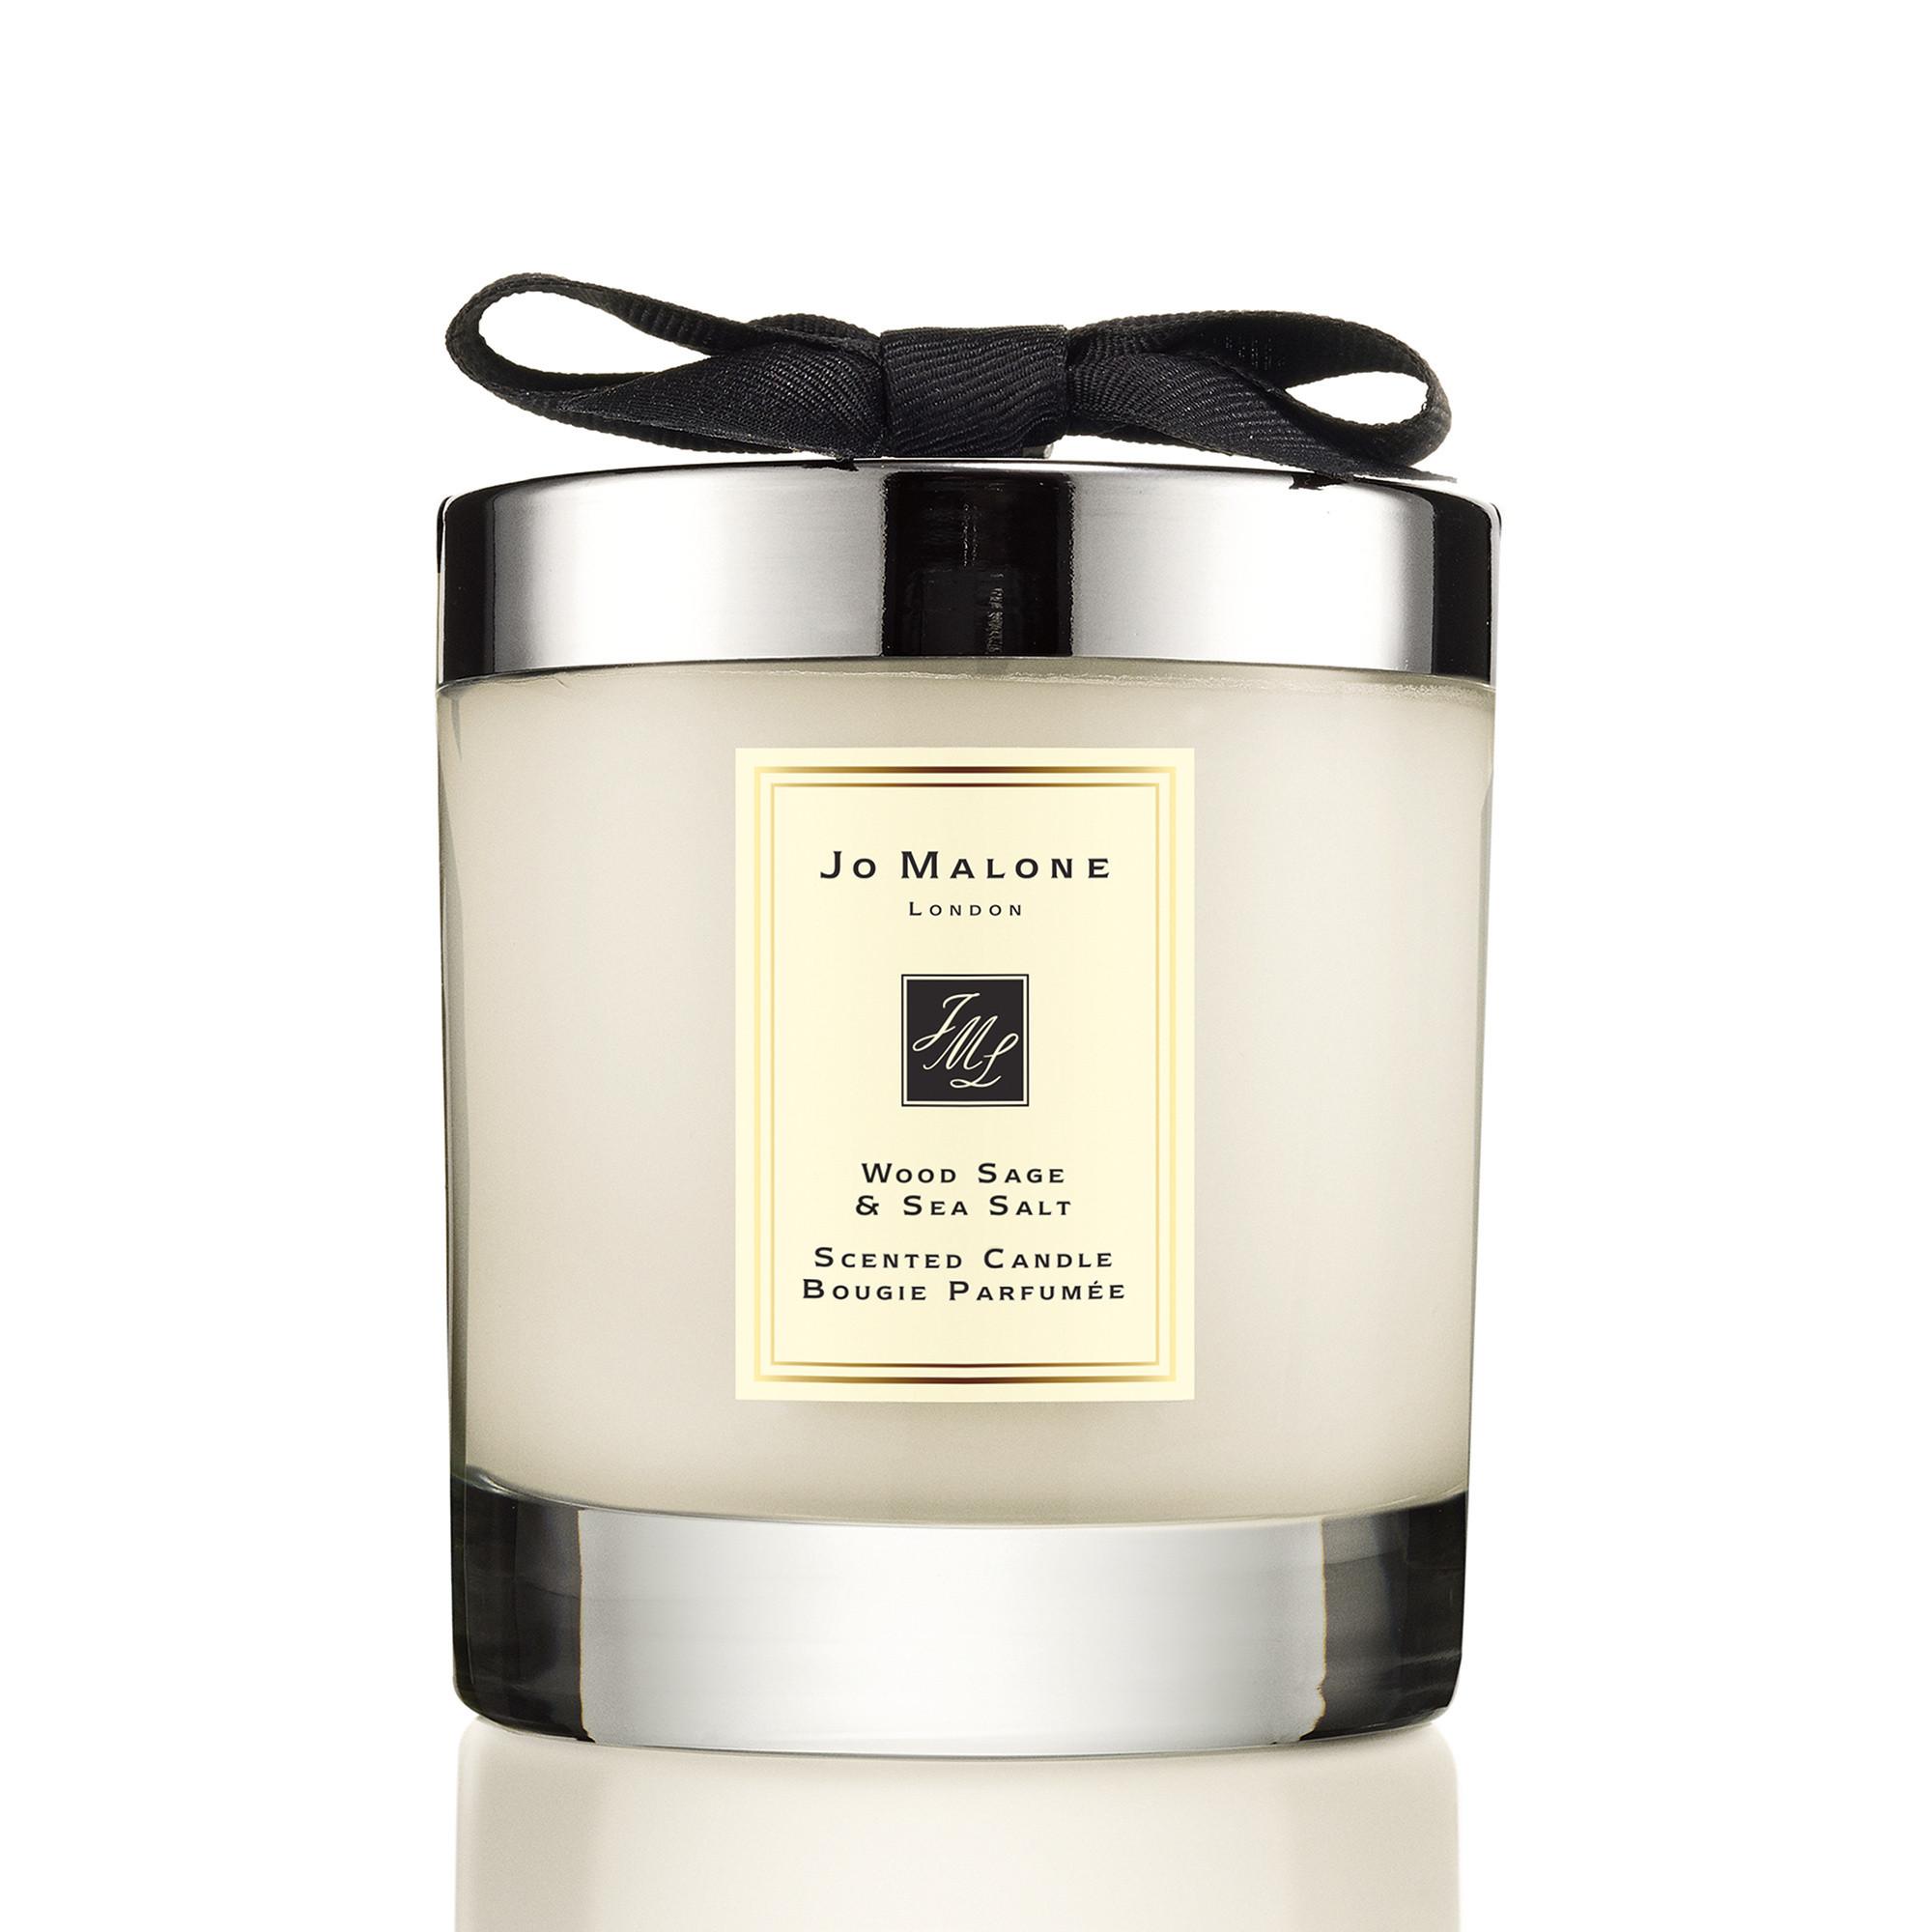 Jo Malone London wood sage & sea salt home candle 200 g, Nero, large image number 0